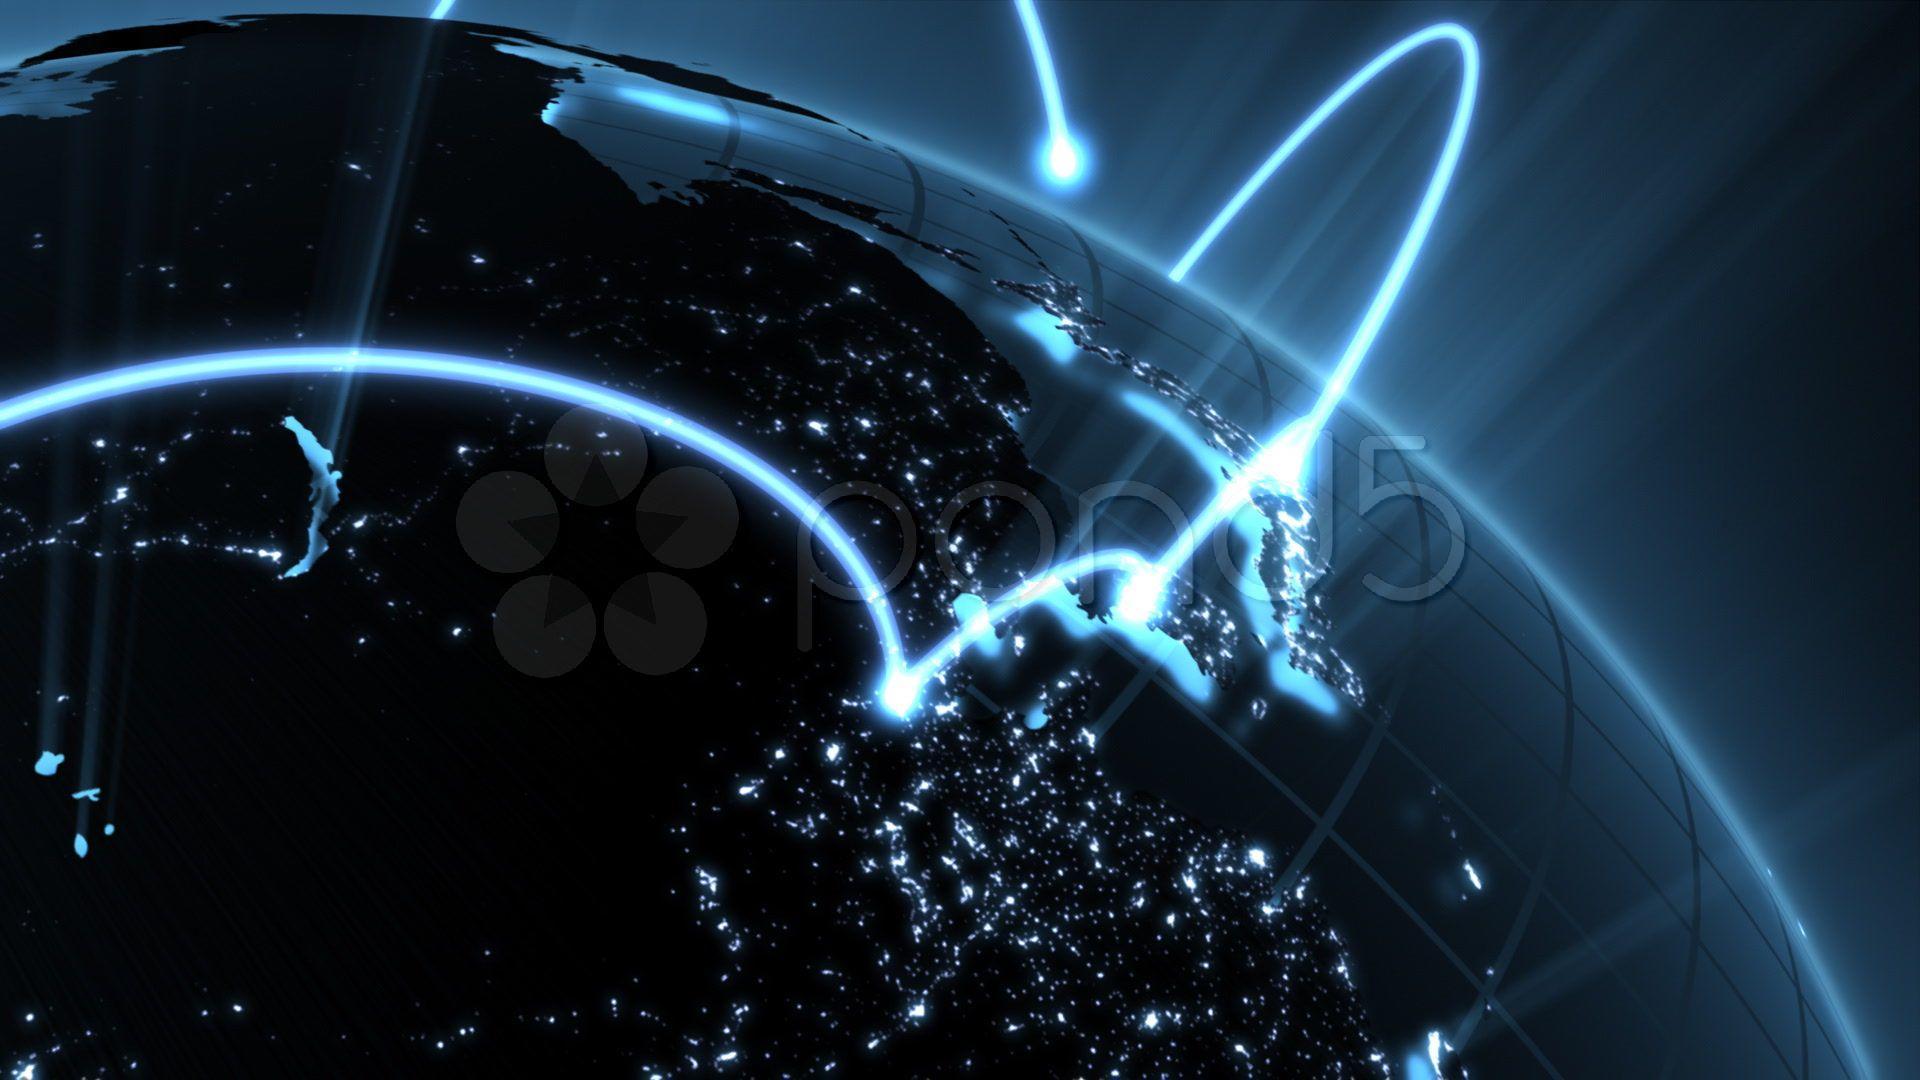 Telecommunications Wallpapers